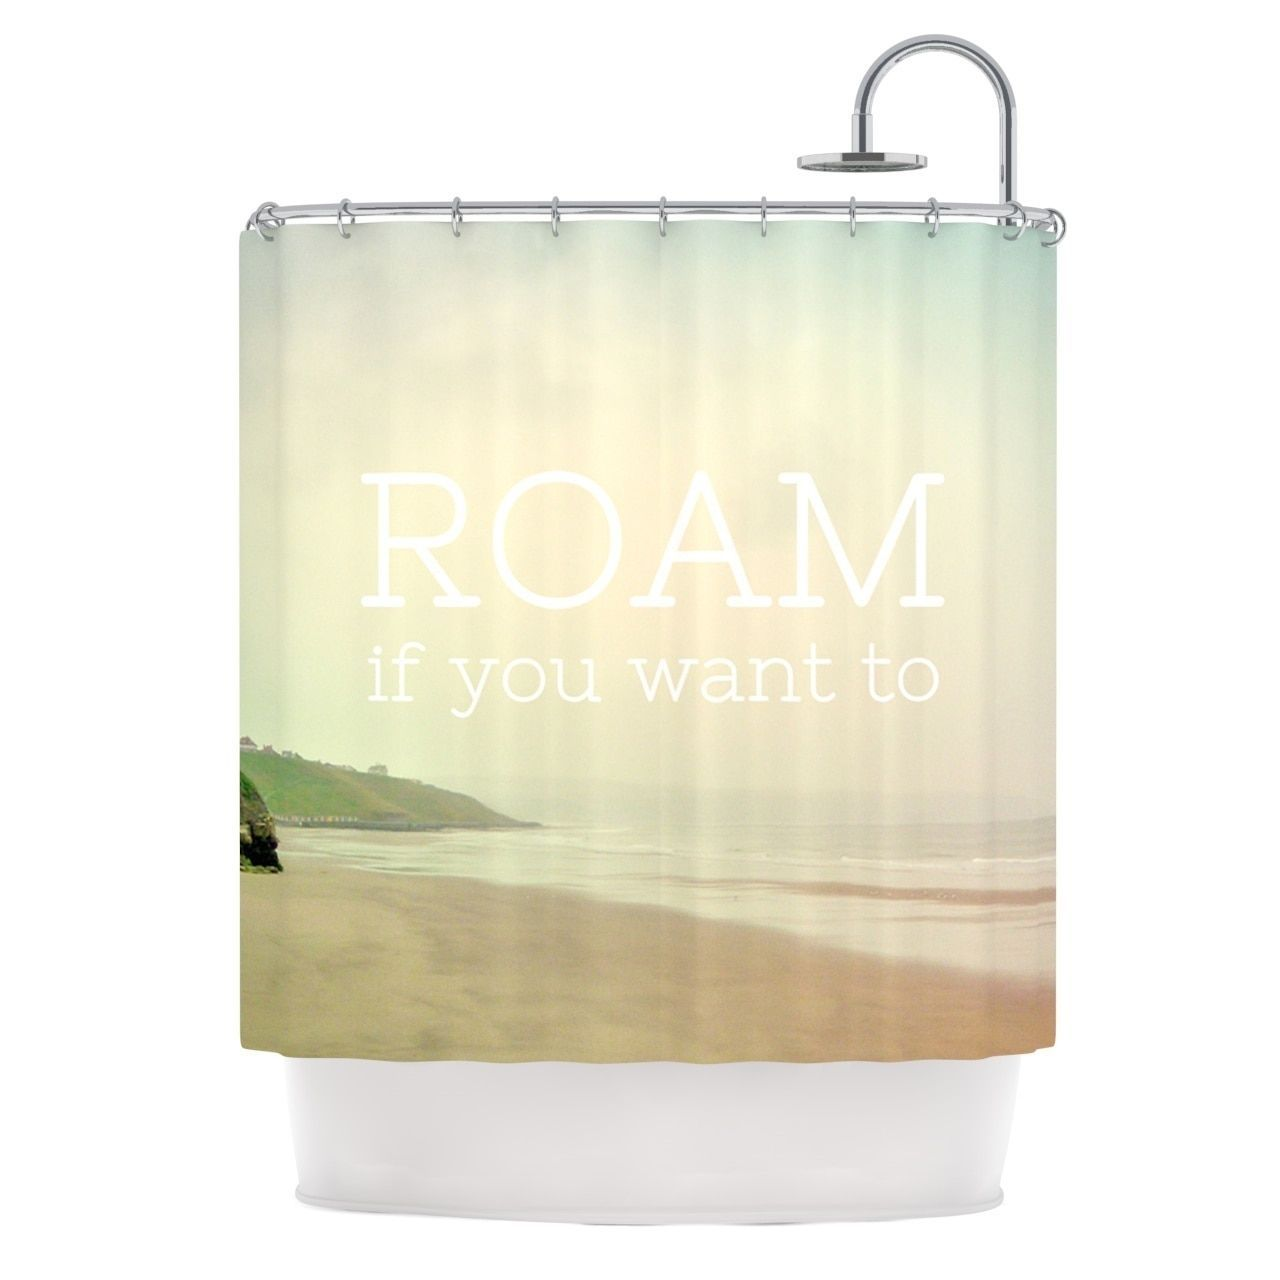 Ocean shower curtains - Kess Inhouse Alison Coxon Roam Ocean Shower Curtain 69x70 By Kess Inhouse